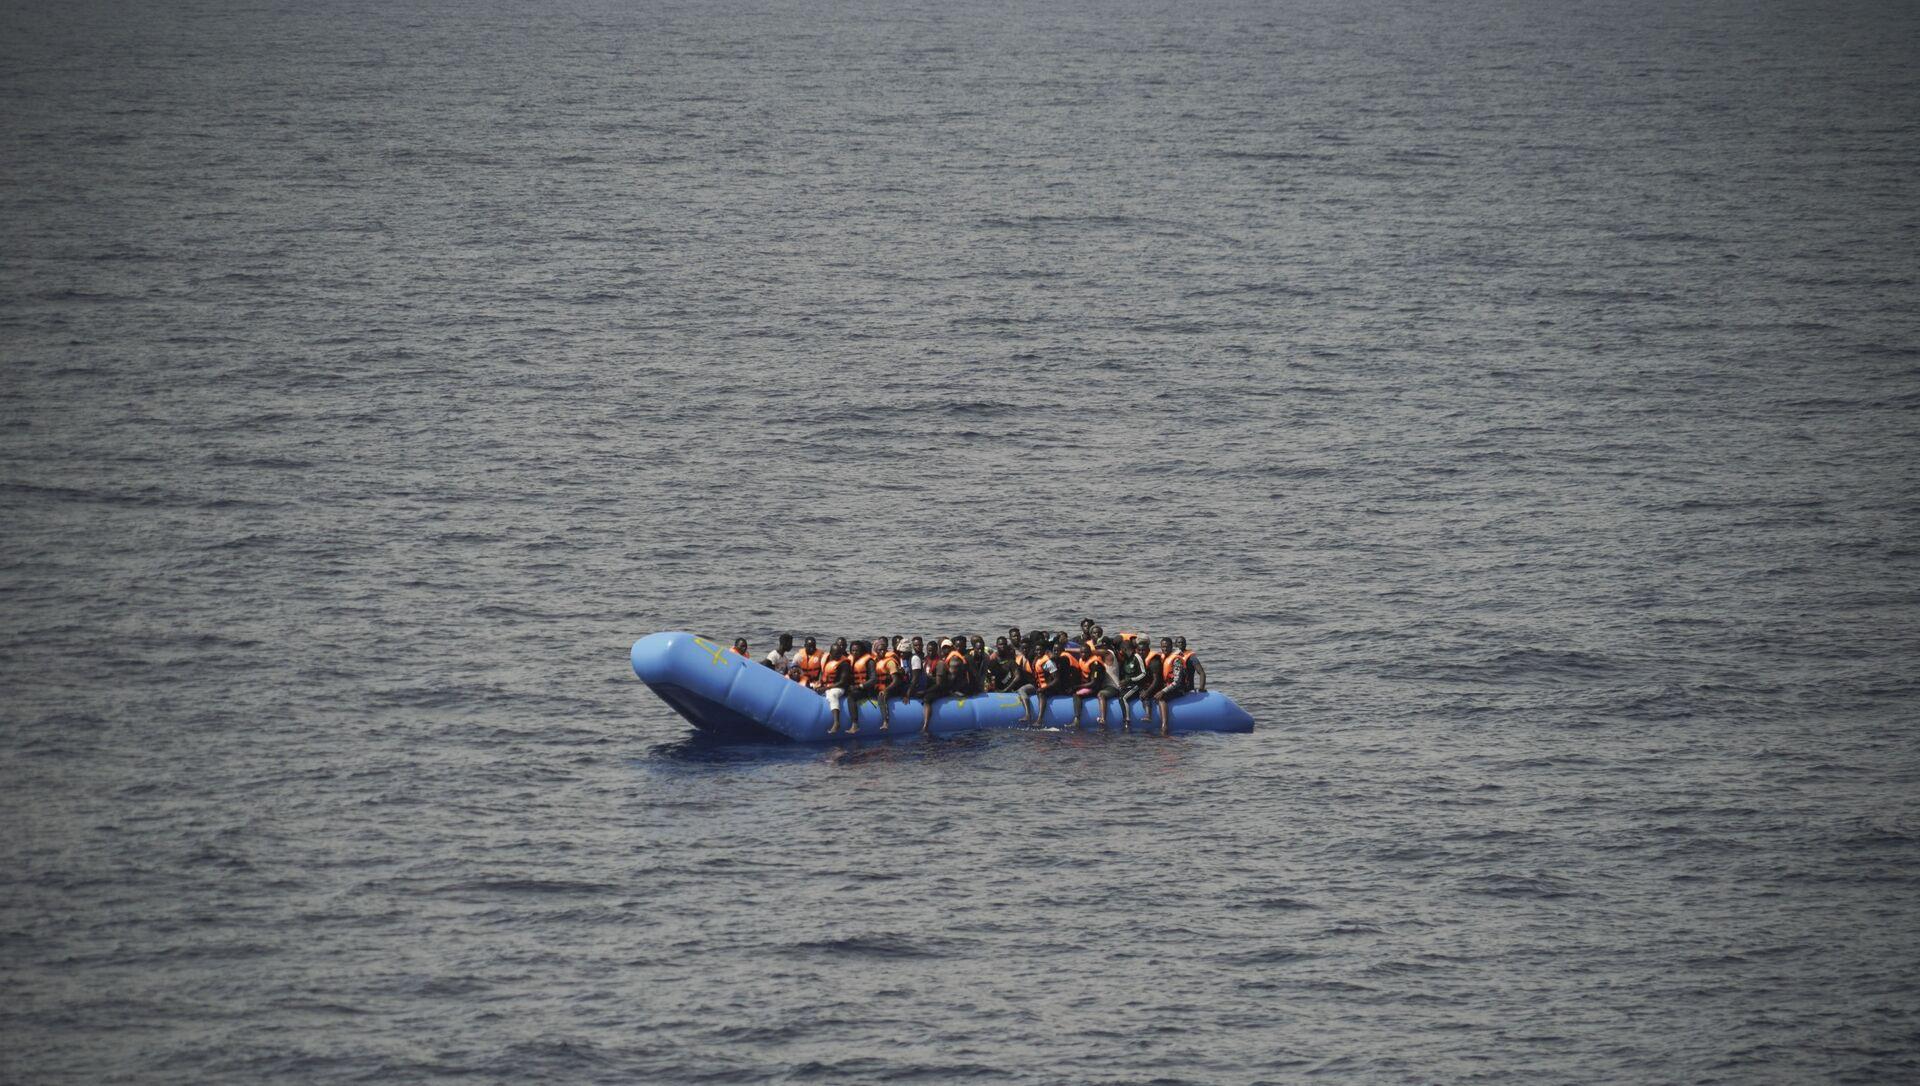 Migranti su una barca - Sputnik Italia, 1920, 27.02.2021